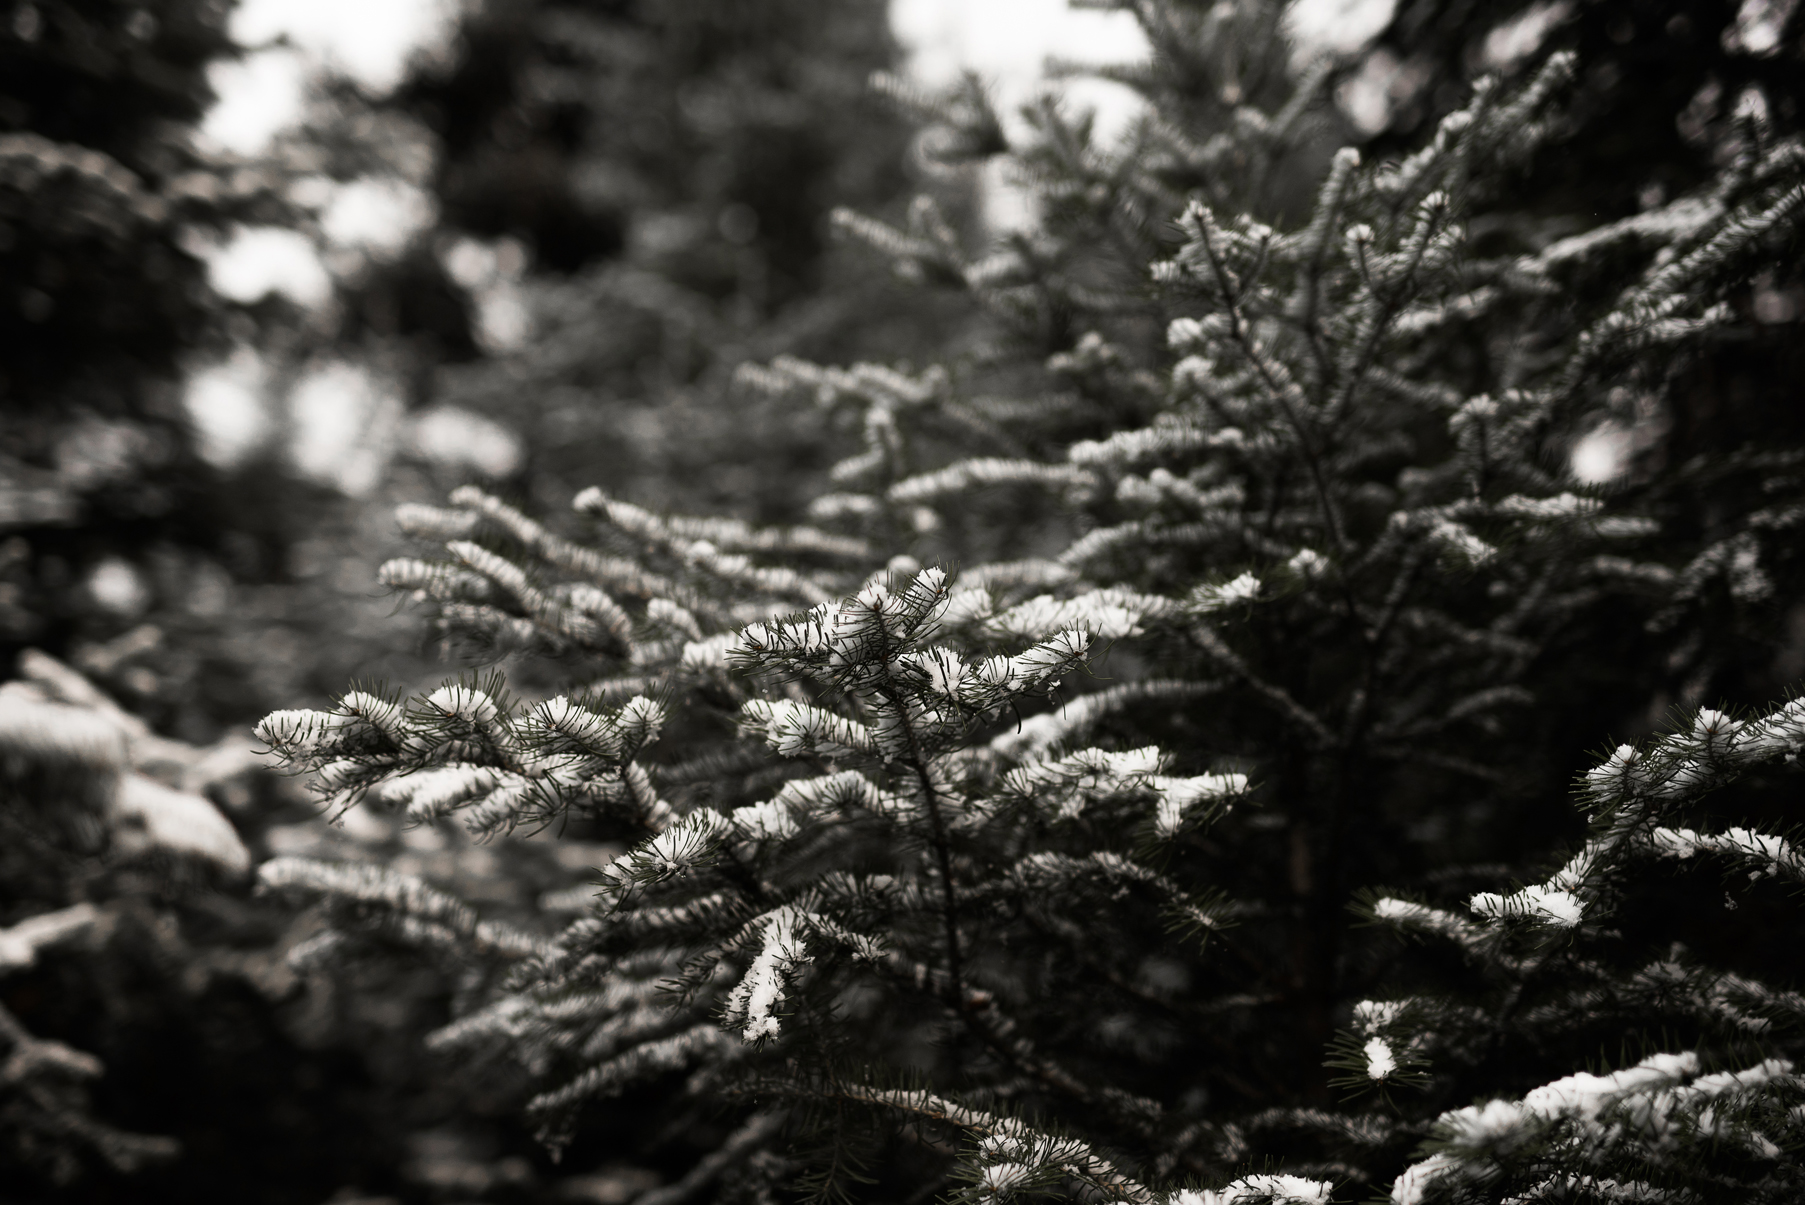 snow covered pine trees near brighton resort